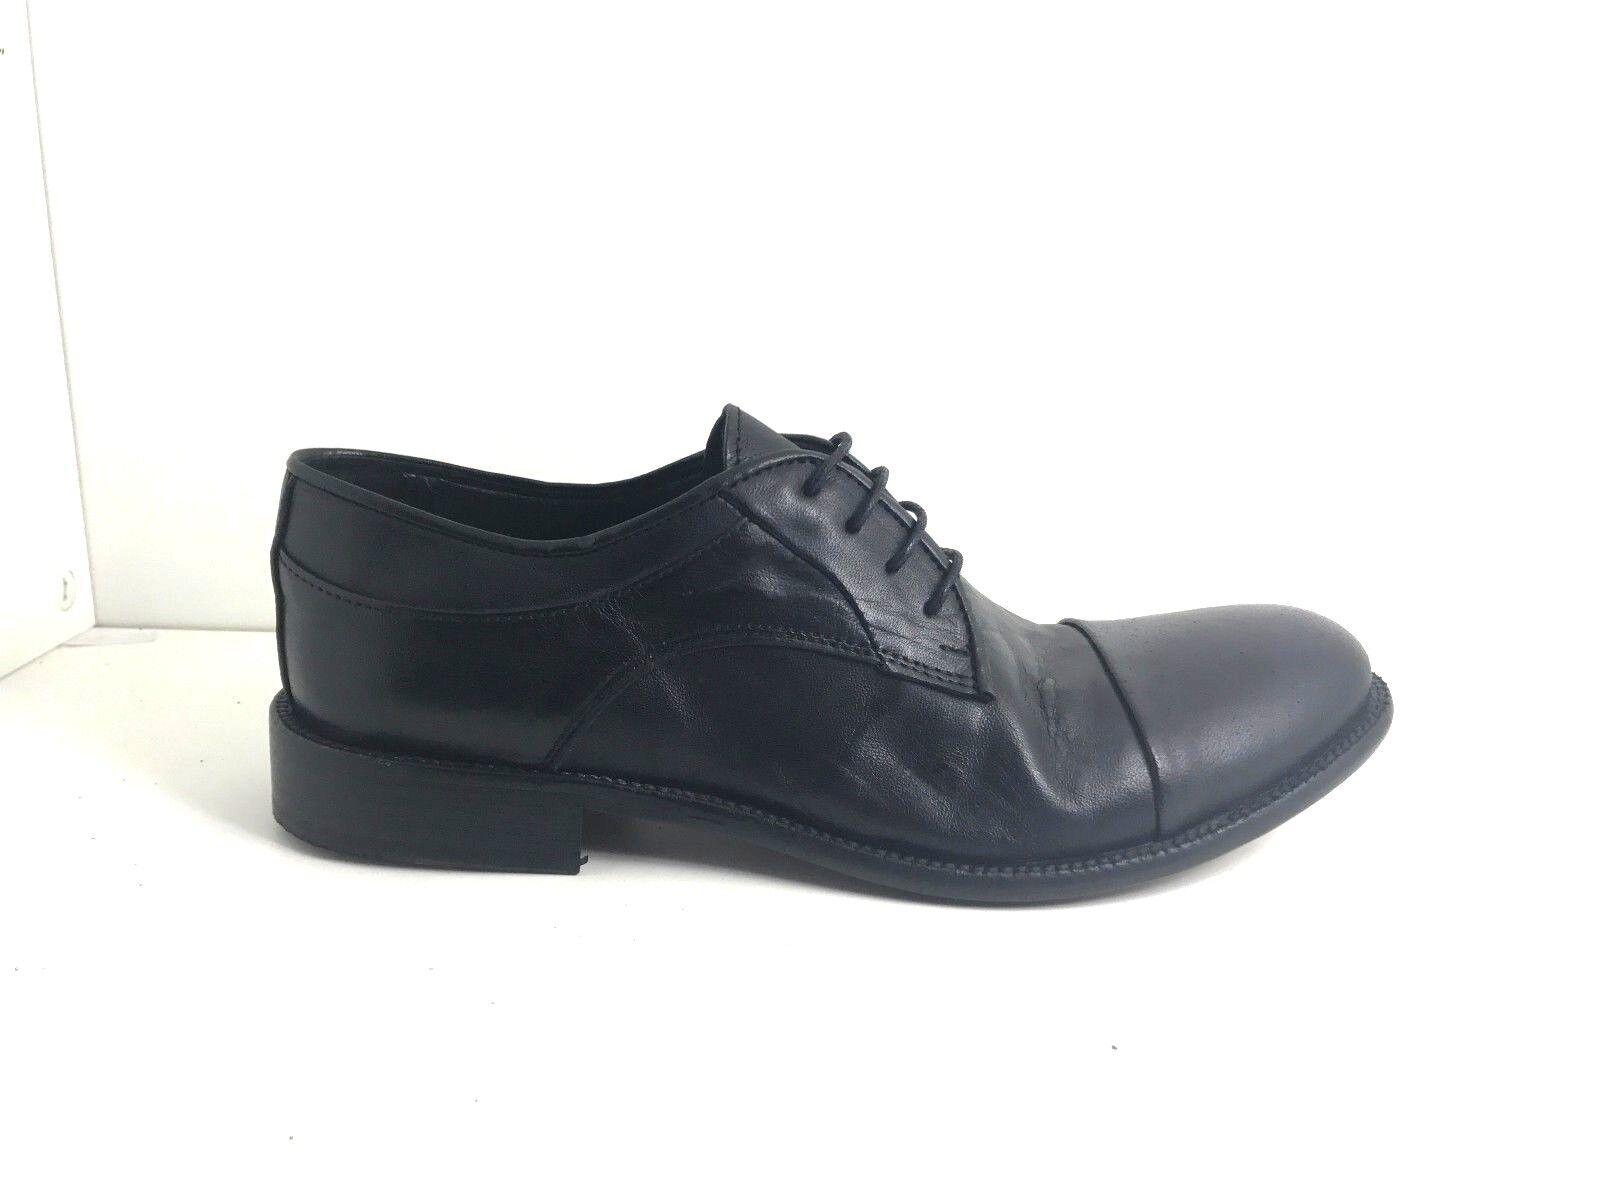 Prem1um scarpe classiche classic uomo shoes made in italy uomo classic man pelle leather 100% f66a3e